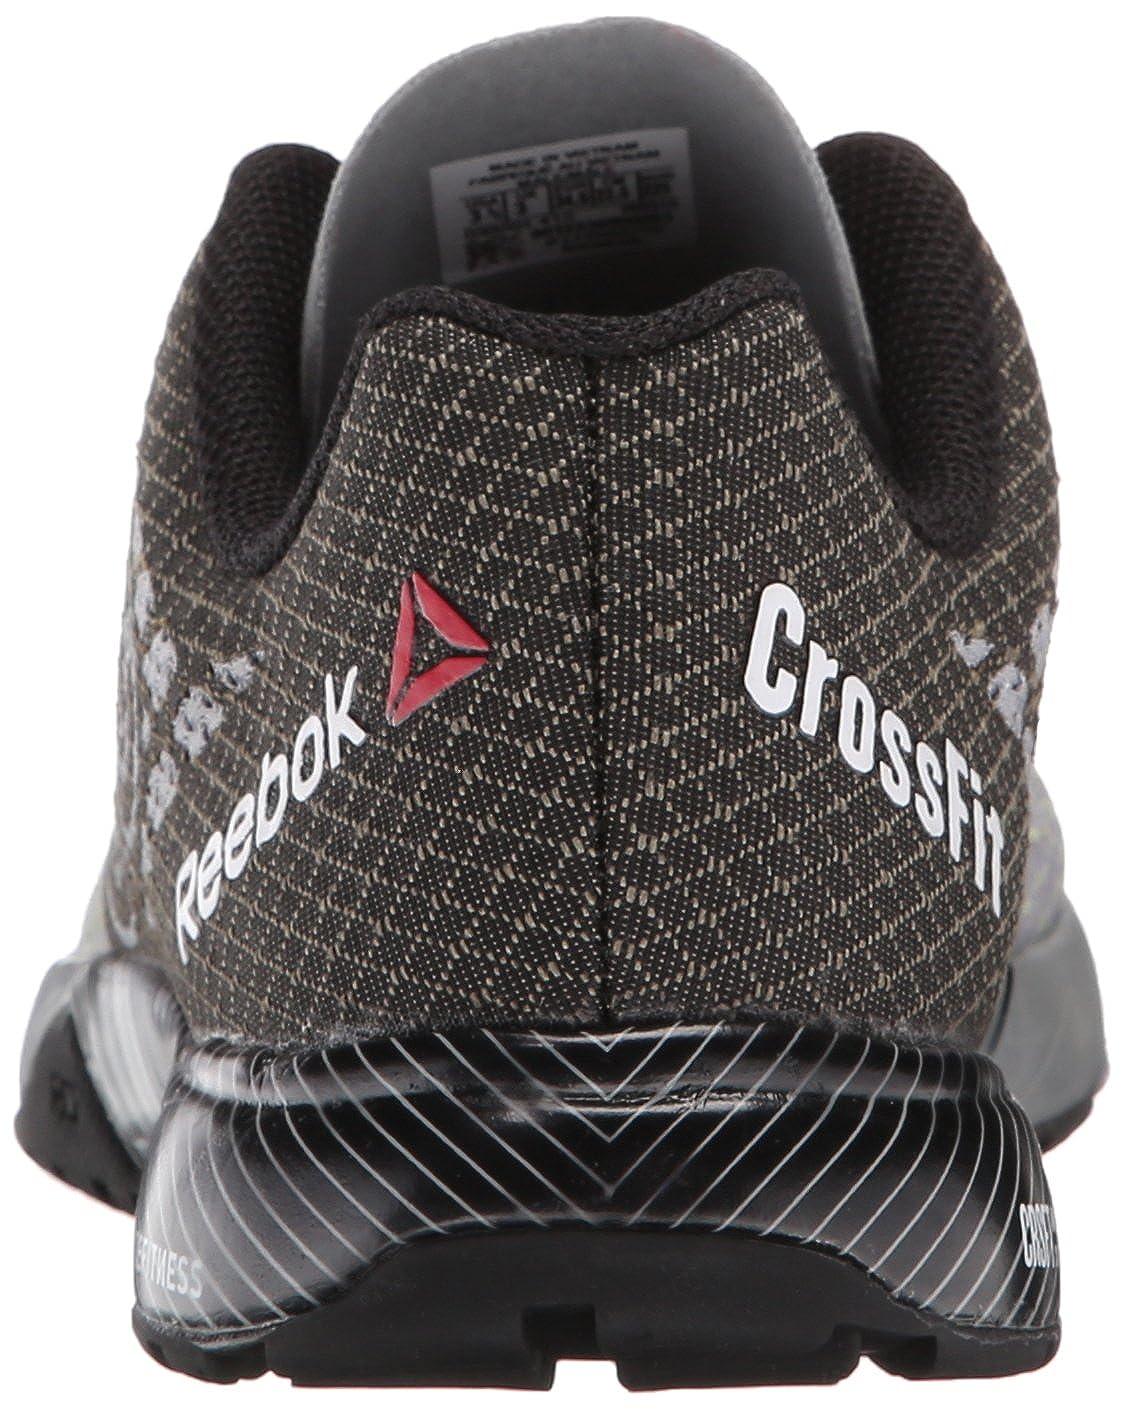 Reebok Crossfit Nano 5.0 Training Shoe Little Kid//Big Kid